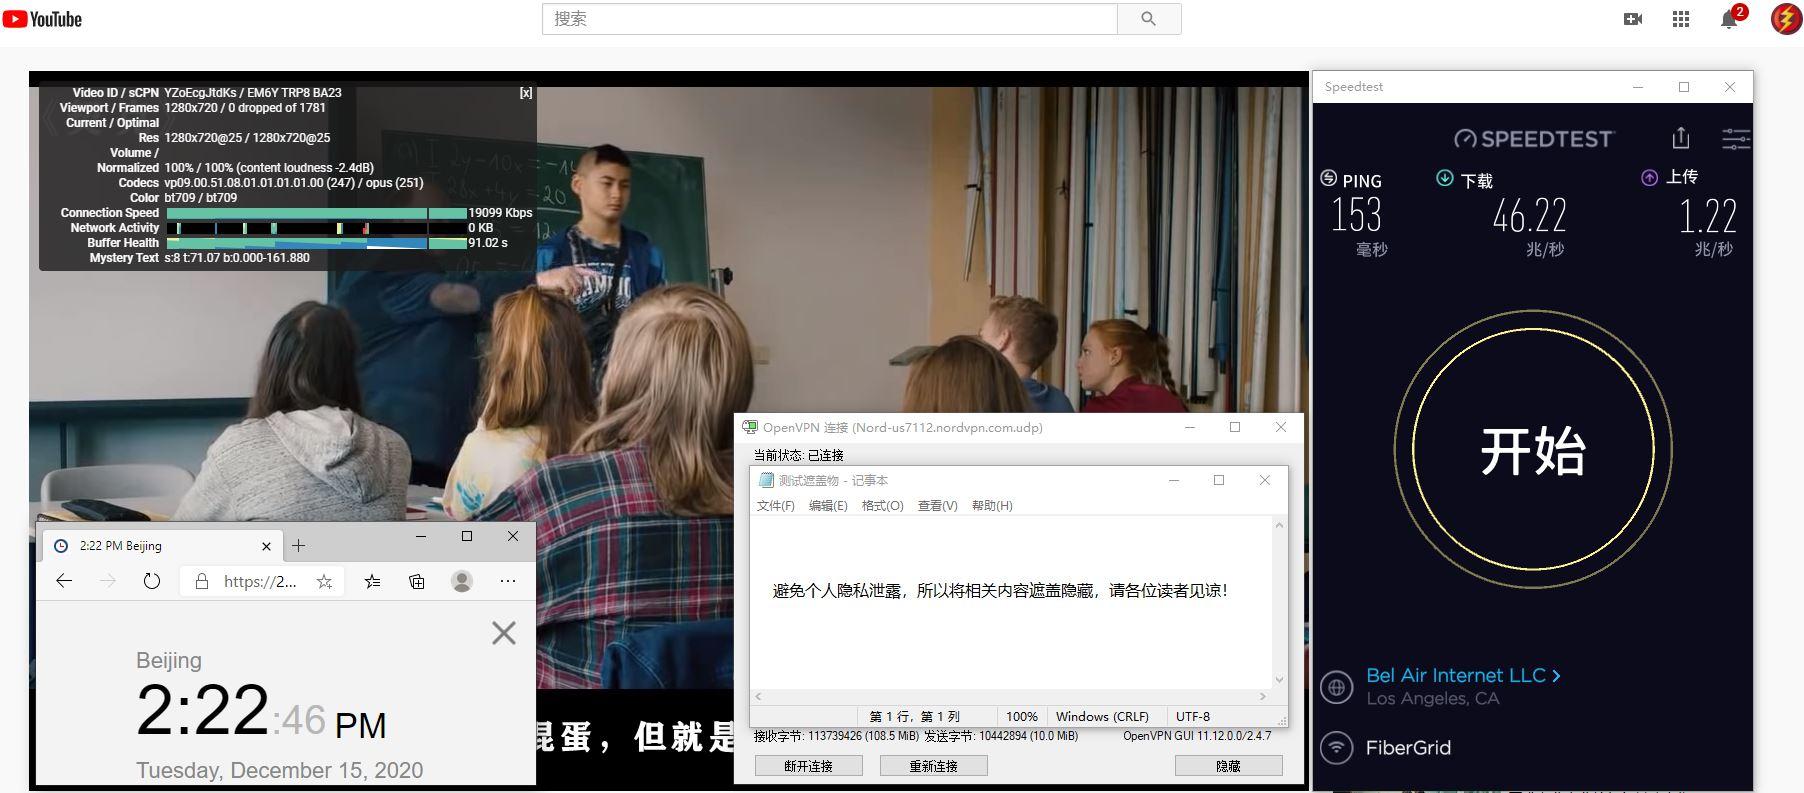 Windows10 NordVPN OpenVPN Gui US7112 服务器 中国VPN 翻墙 科学上网 测试 - 20201215